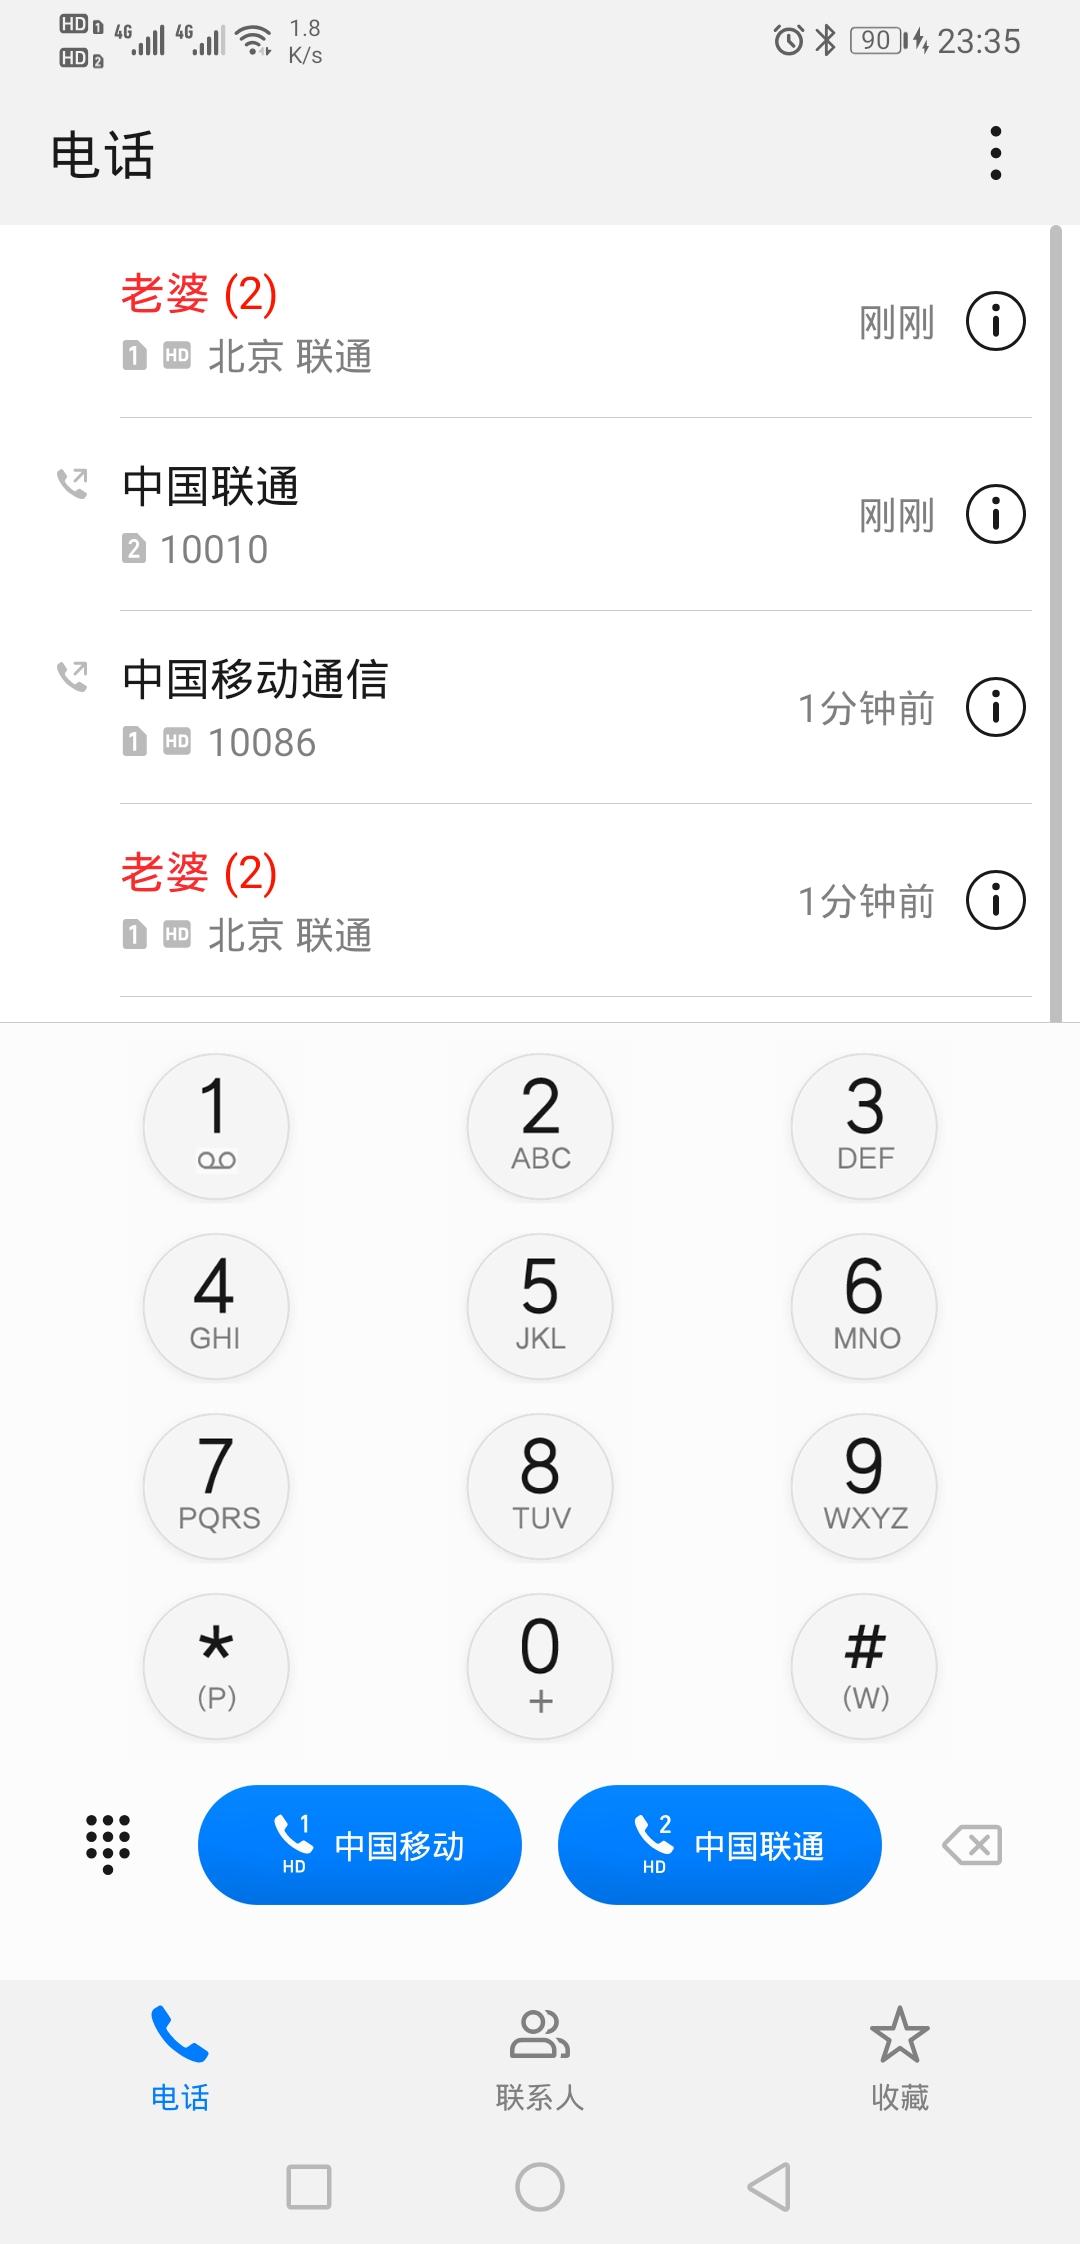 Screenshot_20190911_233546_com.android.contacts.jpg